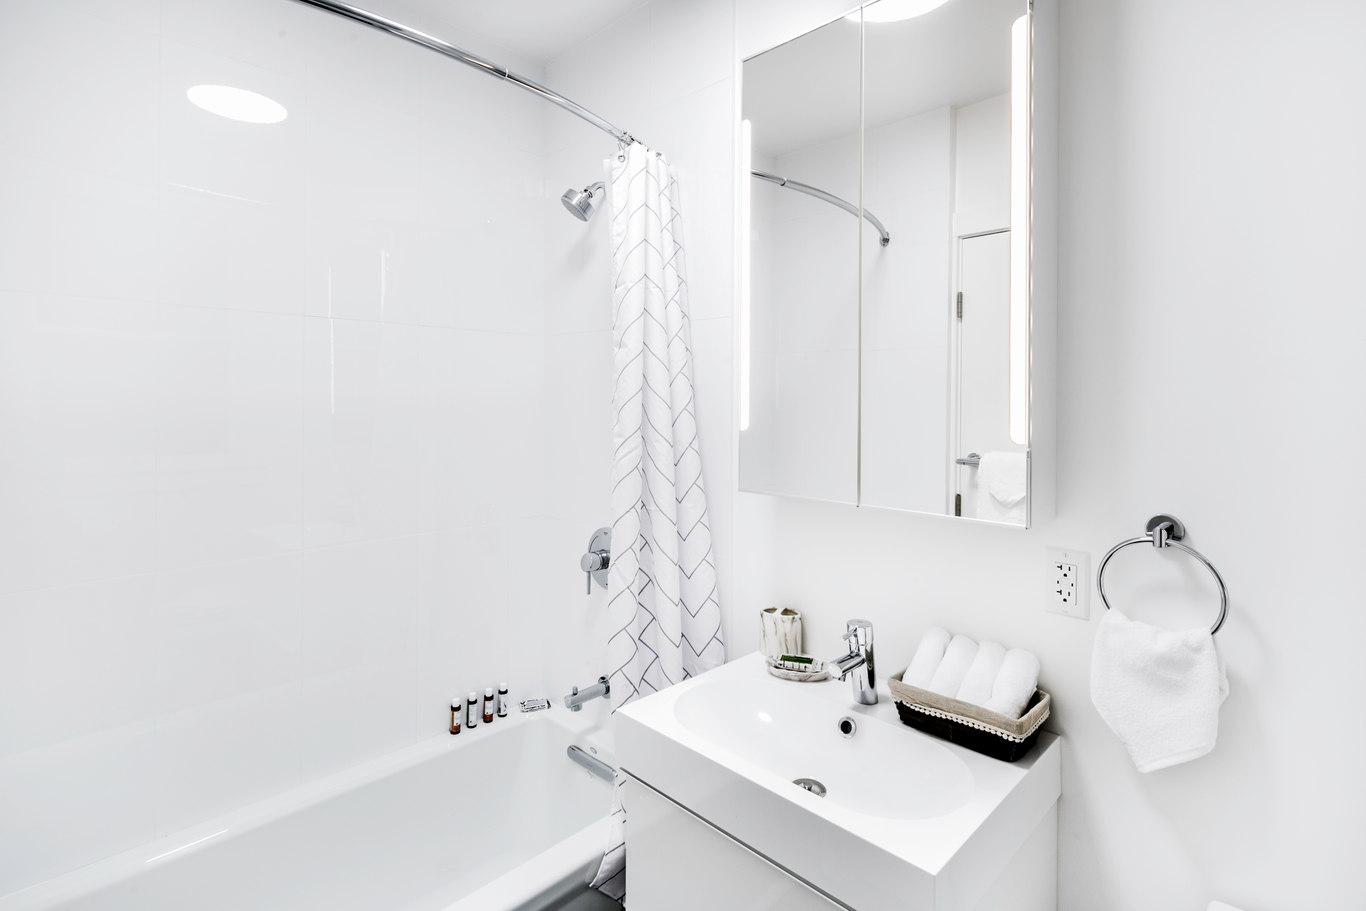 Bathroom at 1801 California Street Apartments, Polk Gulch, San Francisco